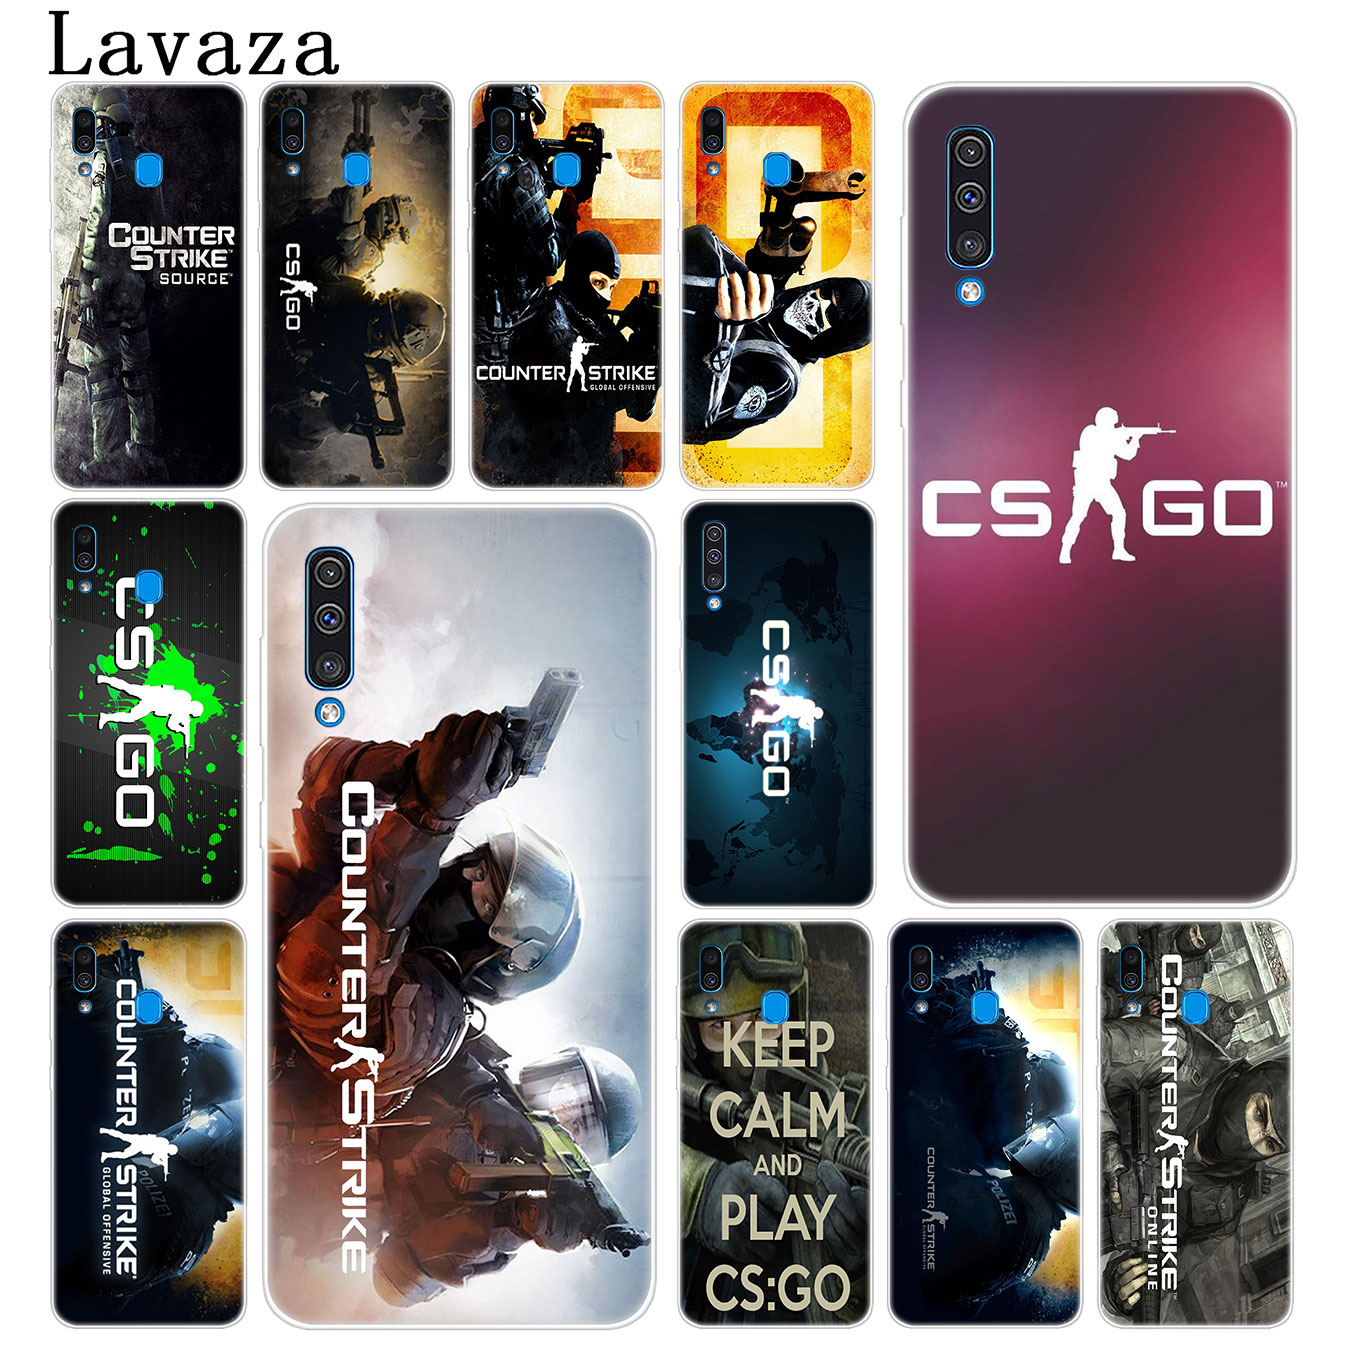 Half-wrapped Case Cellphones & Telecommunications Lavaza Cs Go Counter Strike Gun Strike Hard Transparent Phone Case For Samsung Galaxy A70 A50 A40 A30 A10 M10 M20 M30 Cove In Short Supply